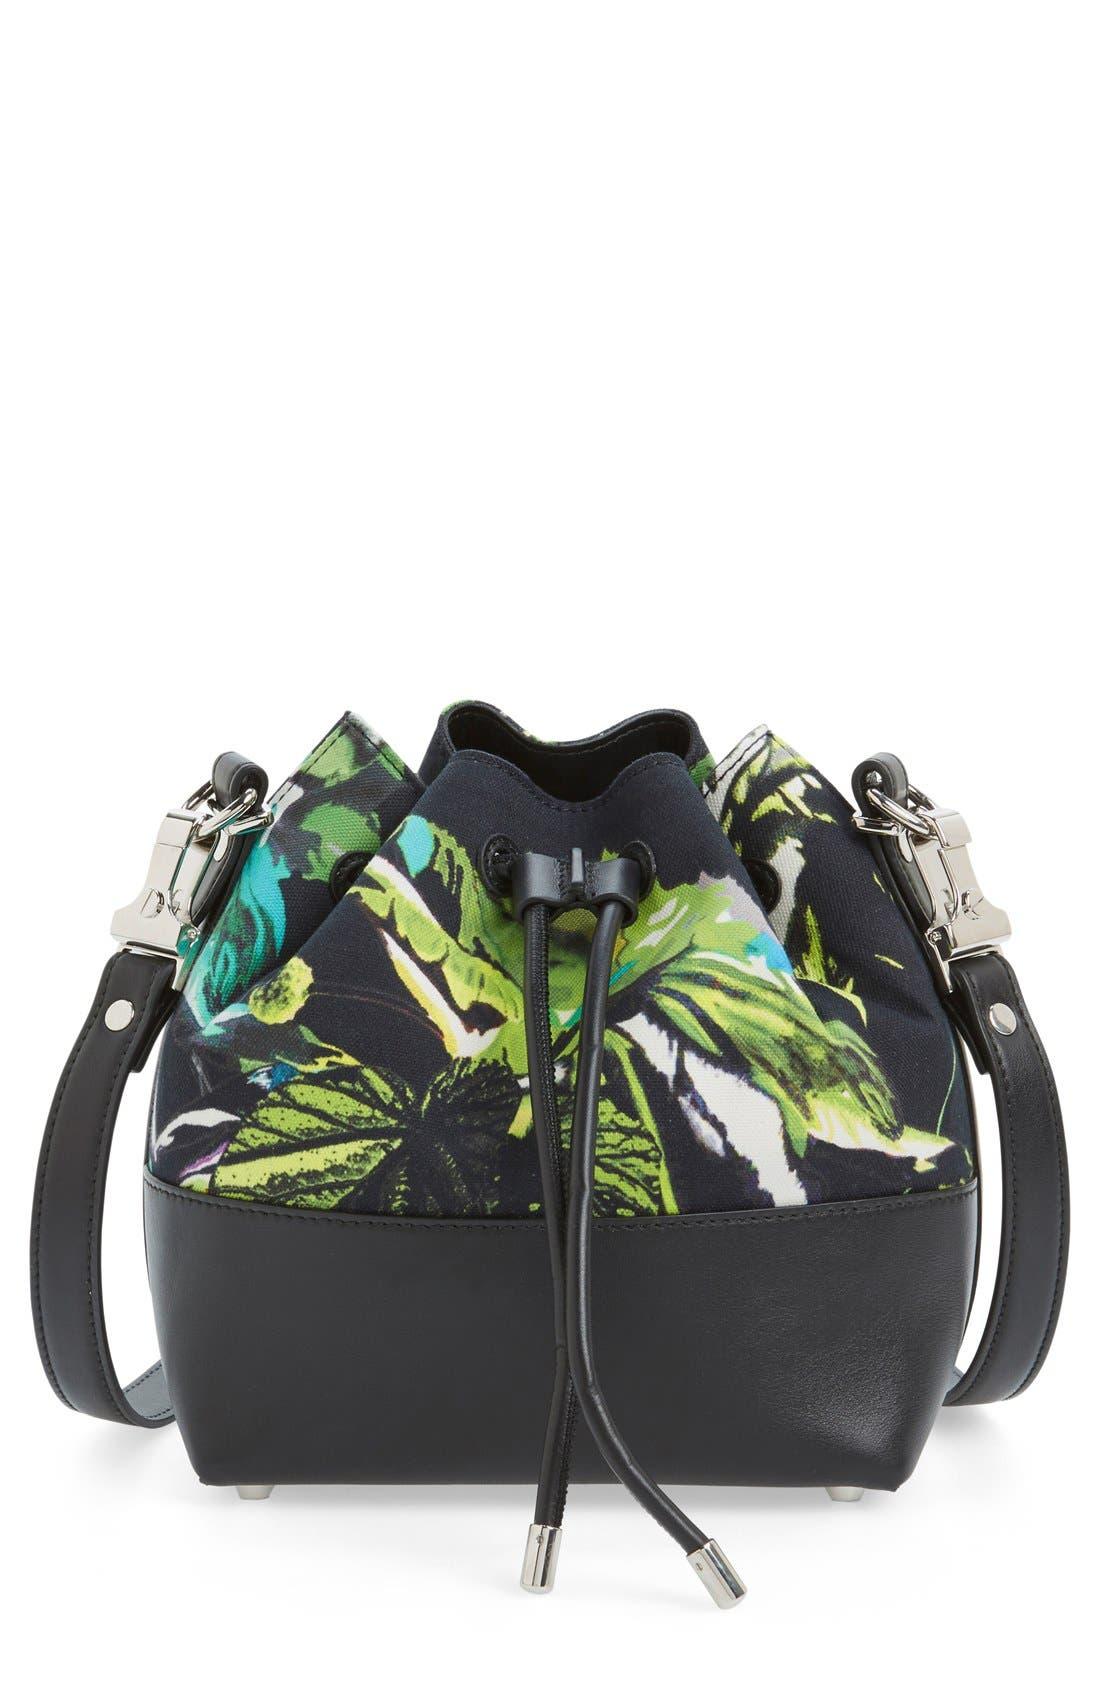 Alternate Image 1 Selected - Proenza Schouler 'Small' Bucket Bag